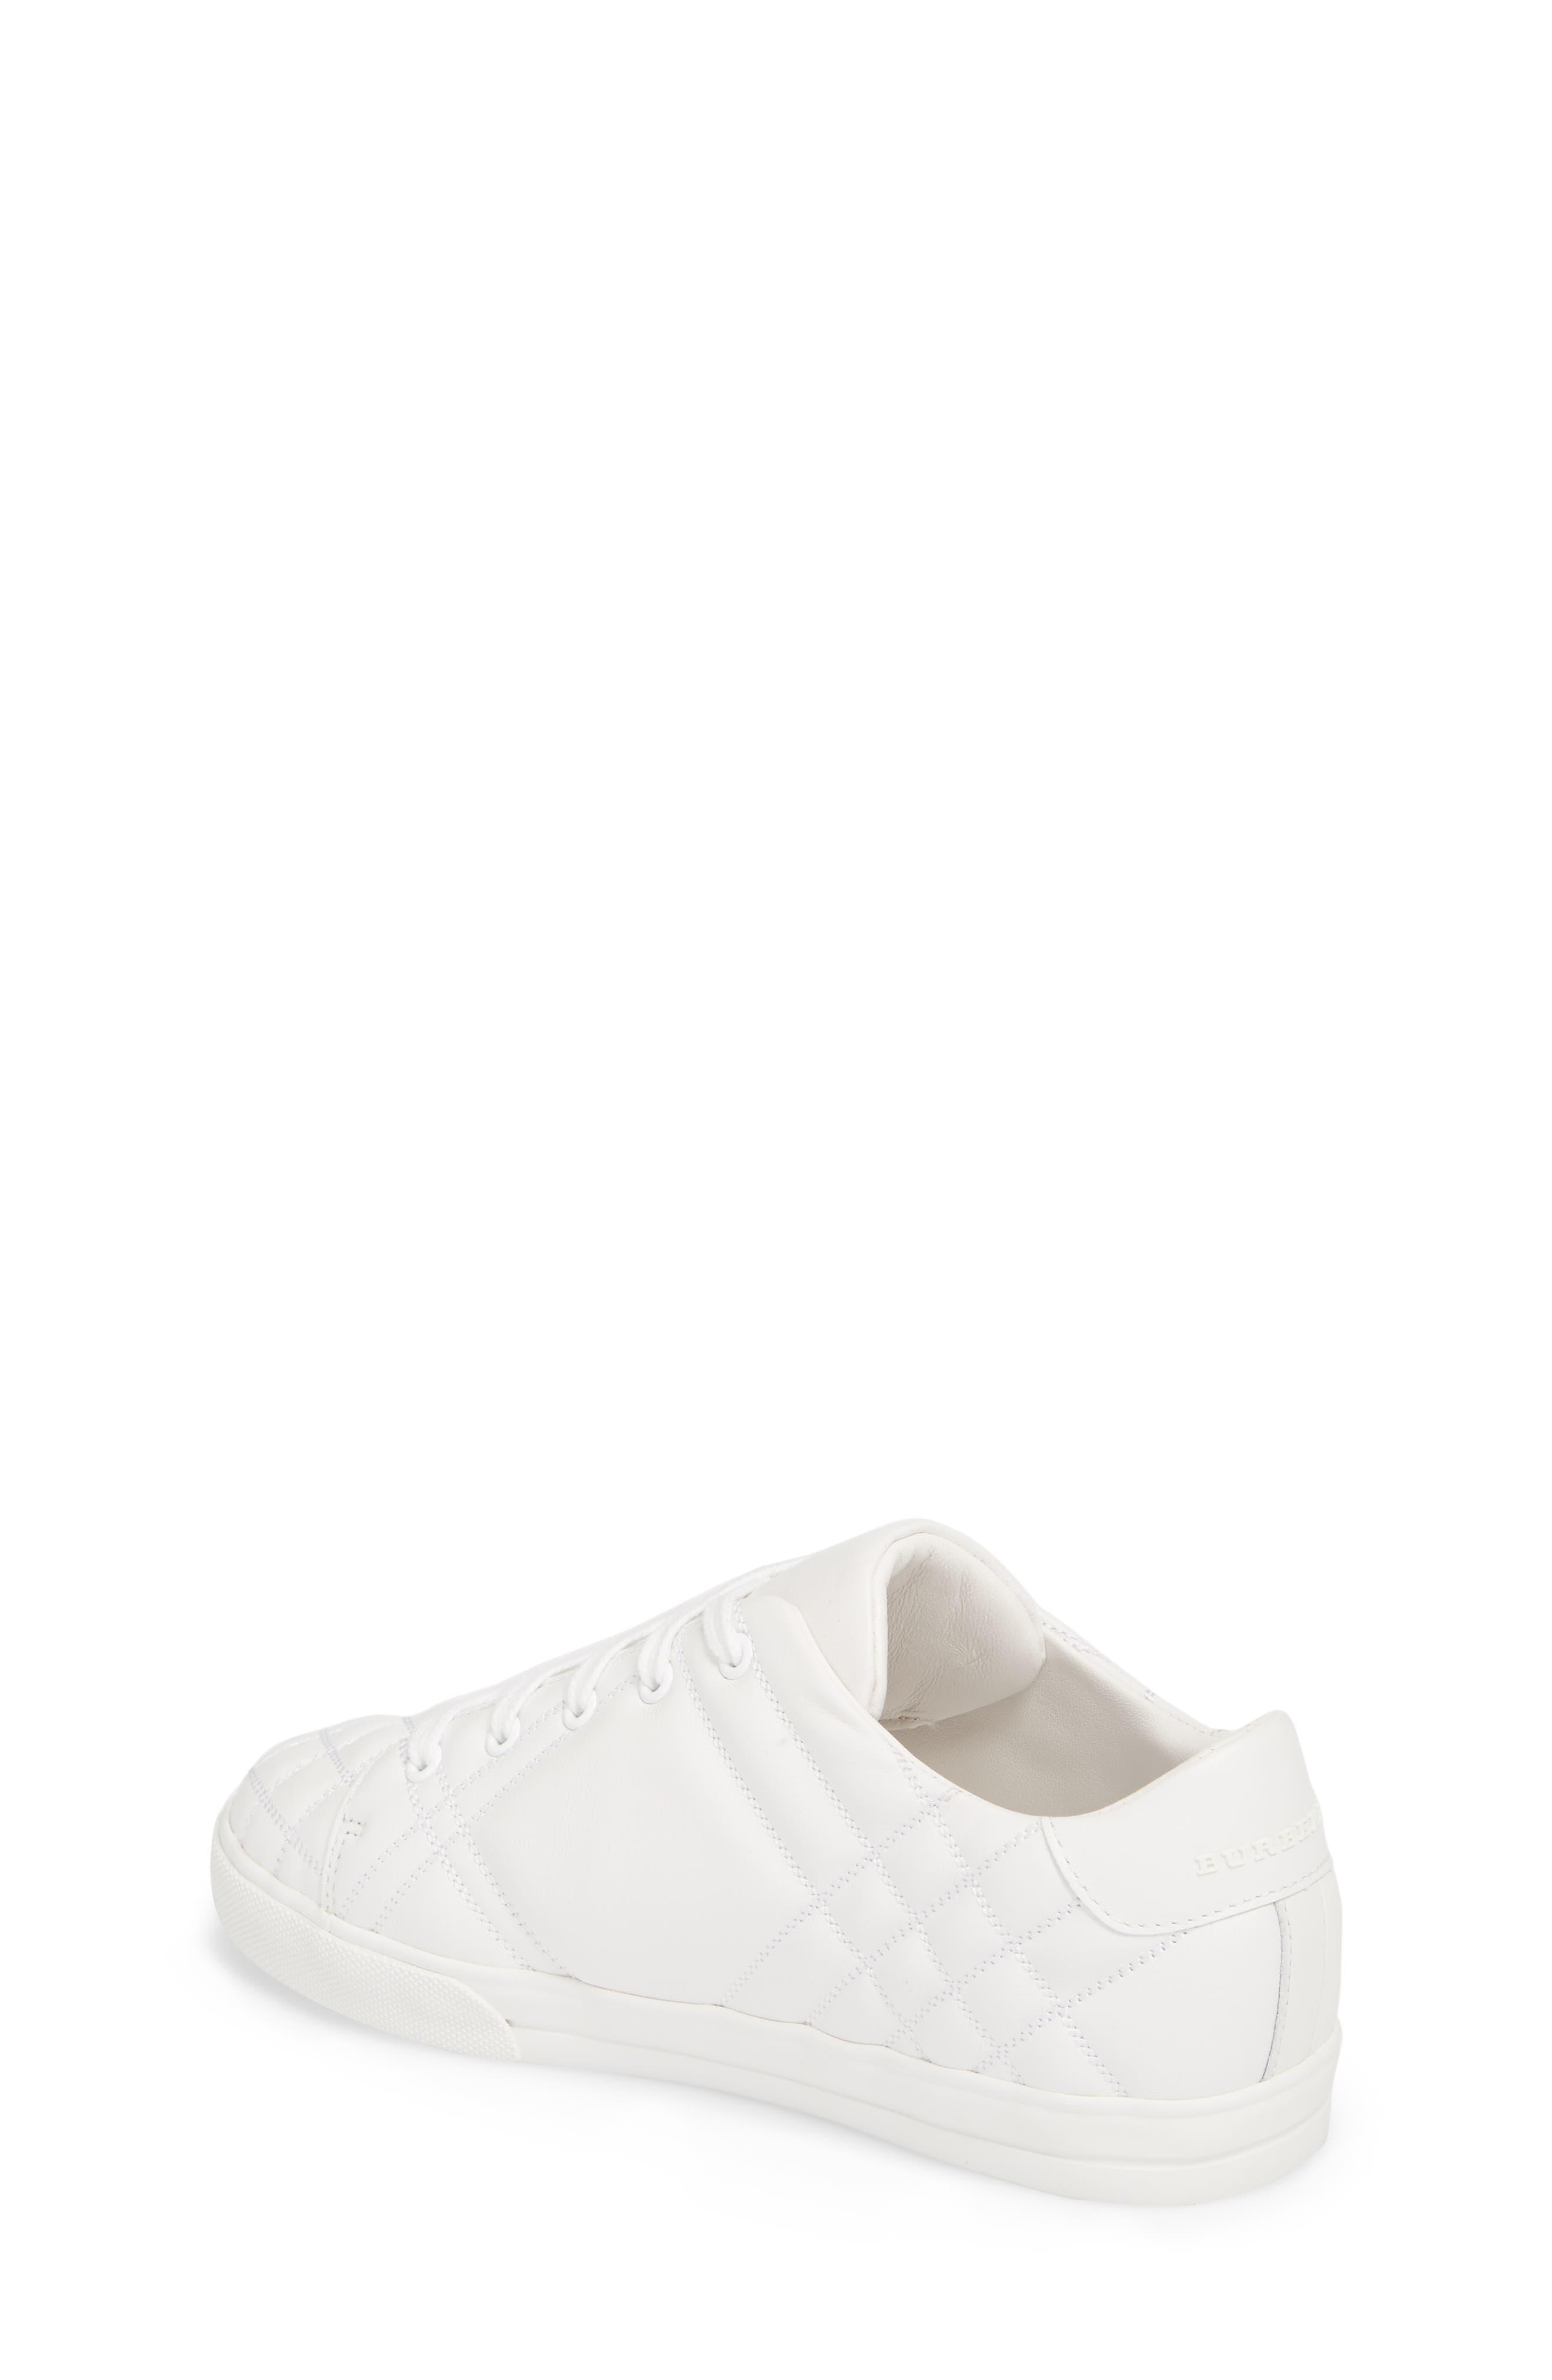 Mini Westford Sneaker,                             Alternate thumbnail 2, color,                             107